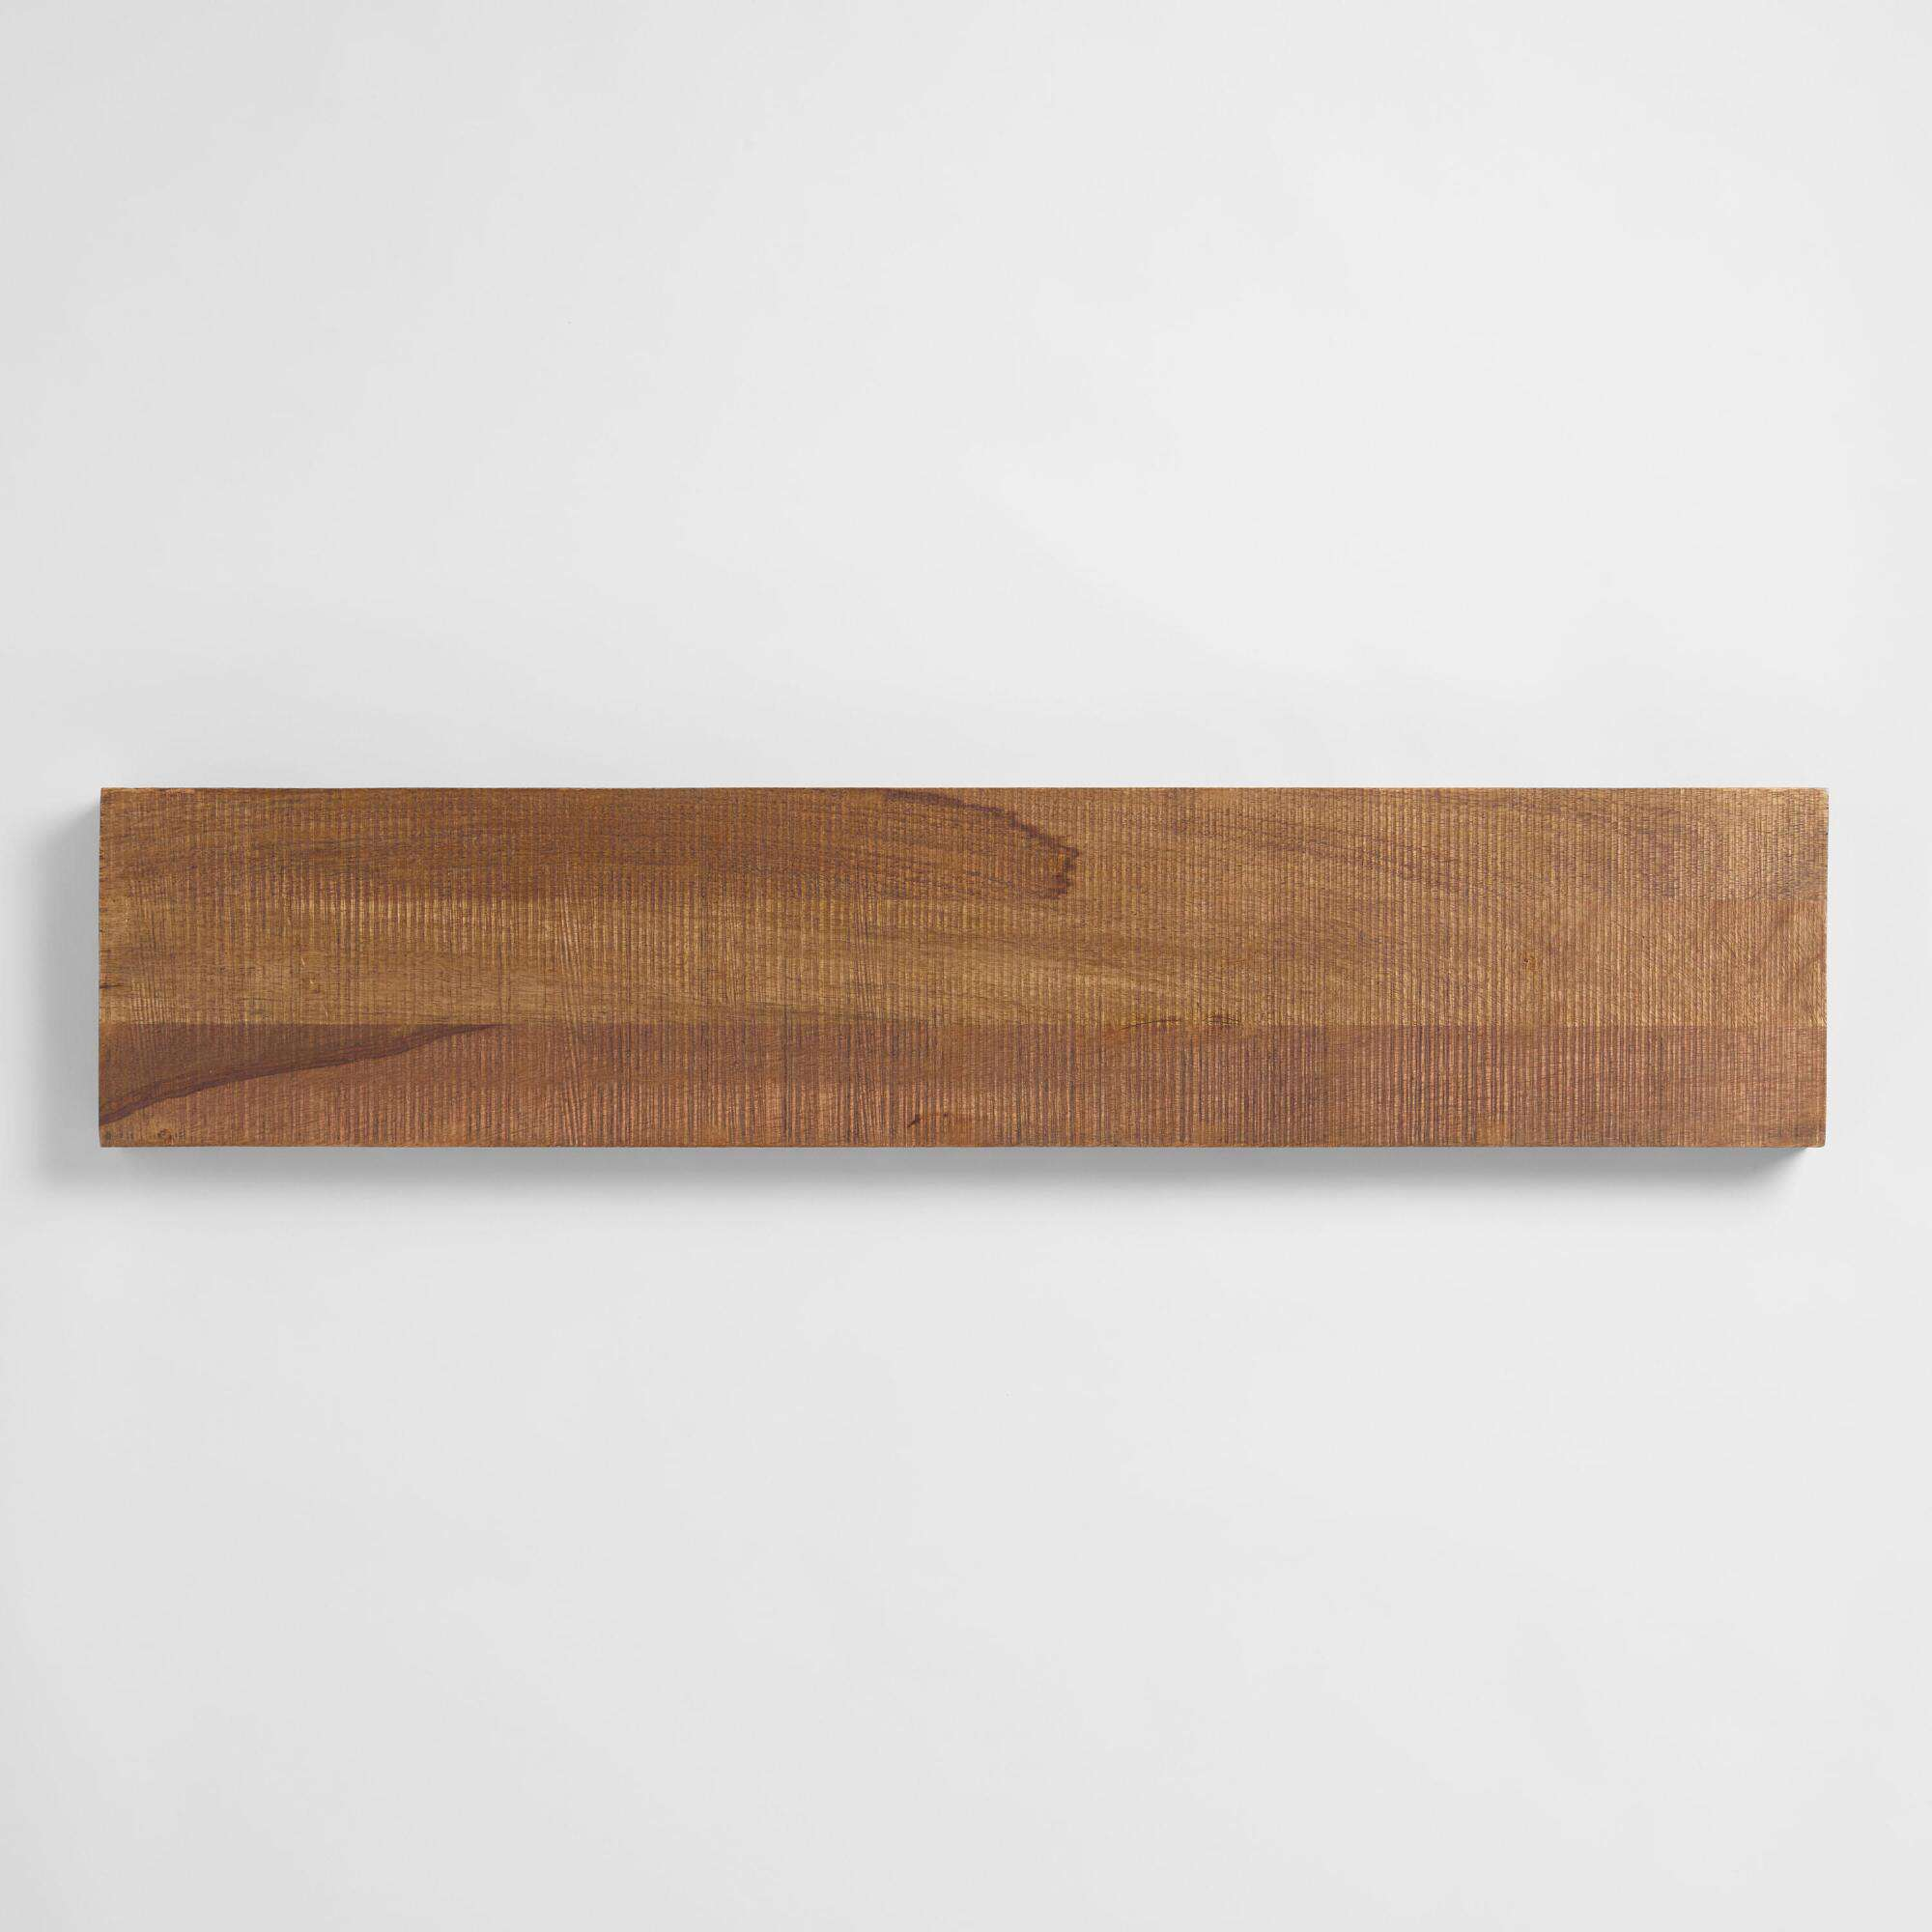 Natural Barn Wood Floating Wall Shelf